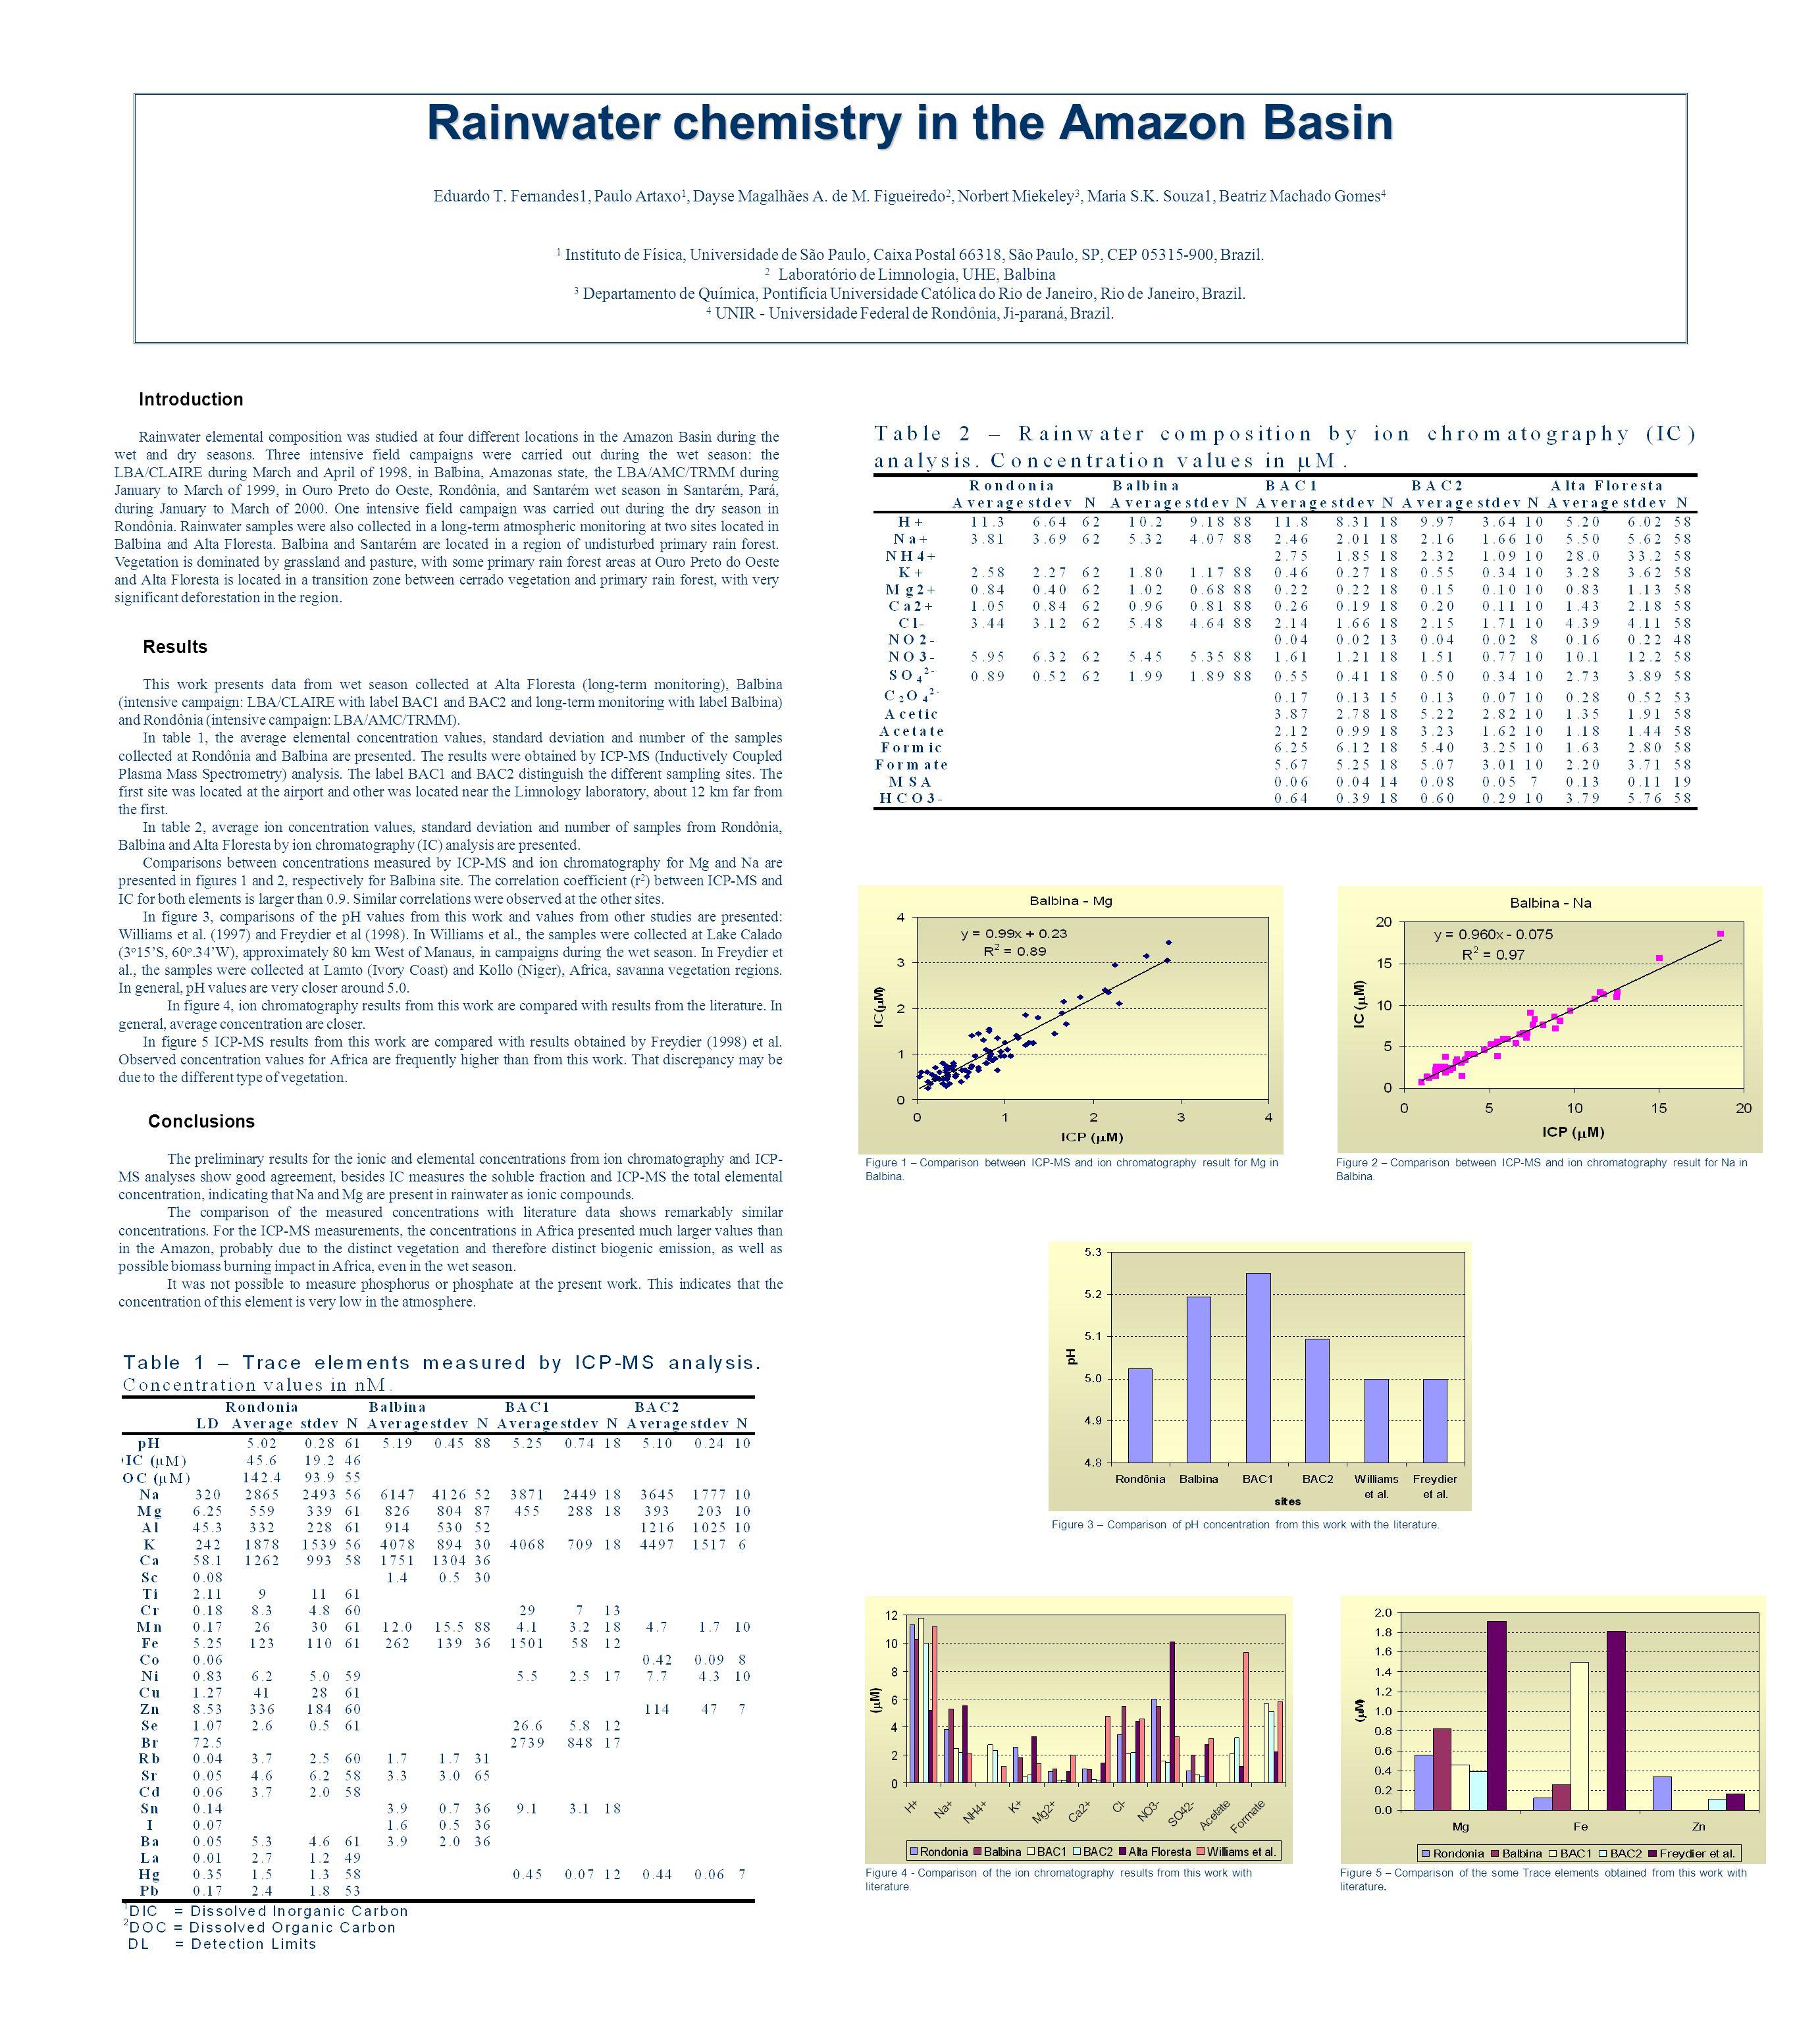 Rainwater Basin Chemistry In Amazon The N0nZ8PXwOk